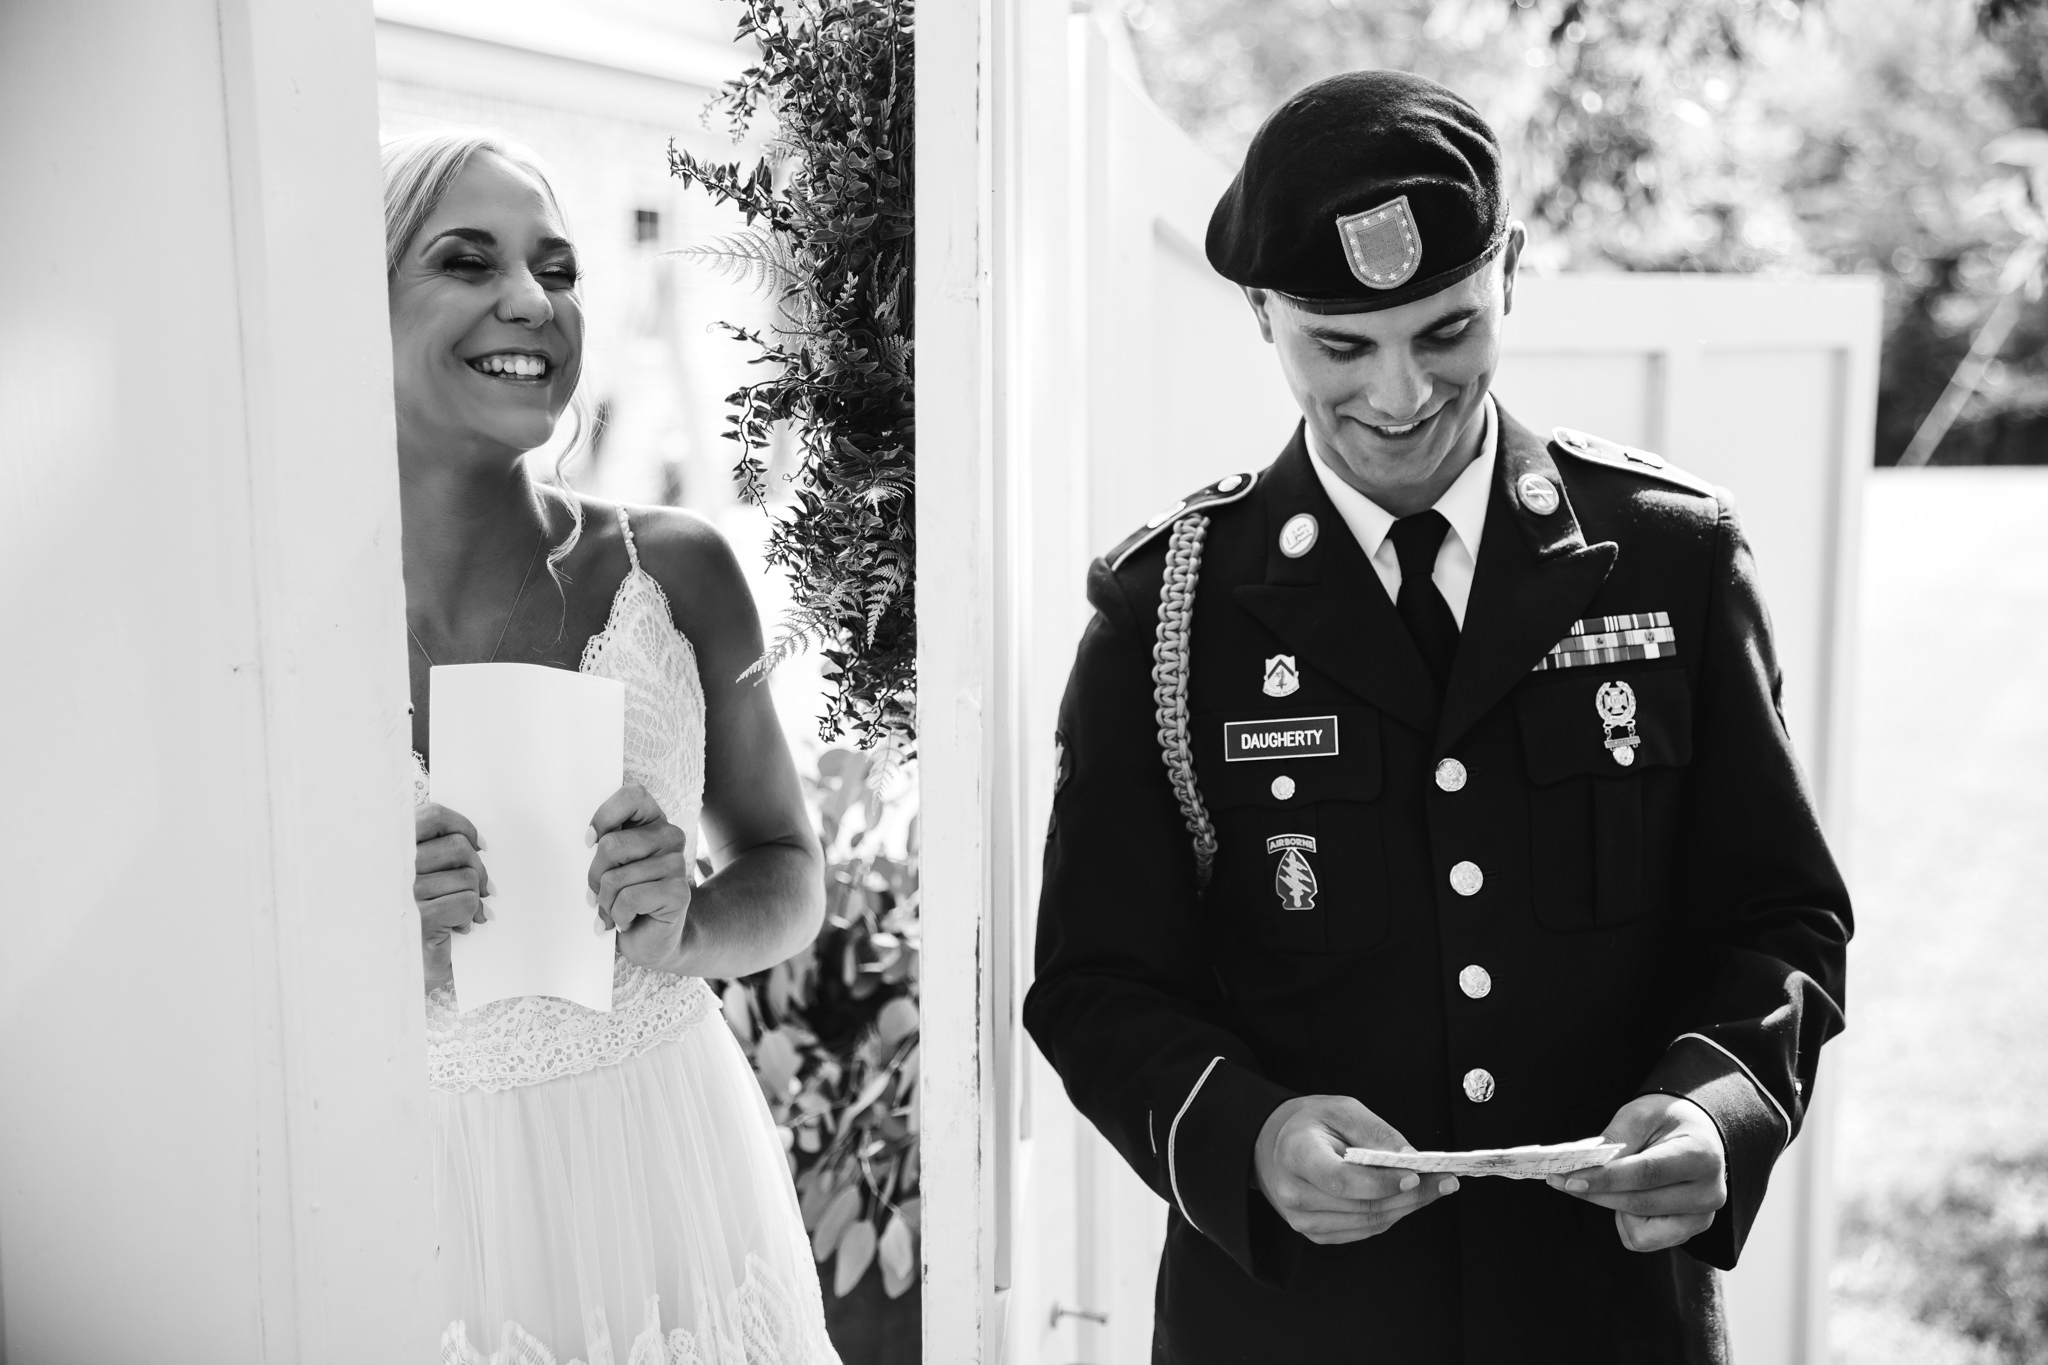 backyard-wedding-thewarmtharoundyou-lexy-branson-30.jpg